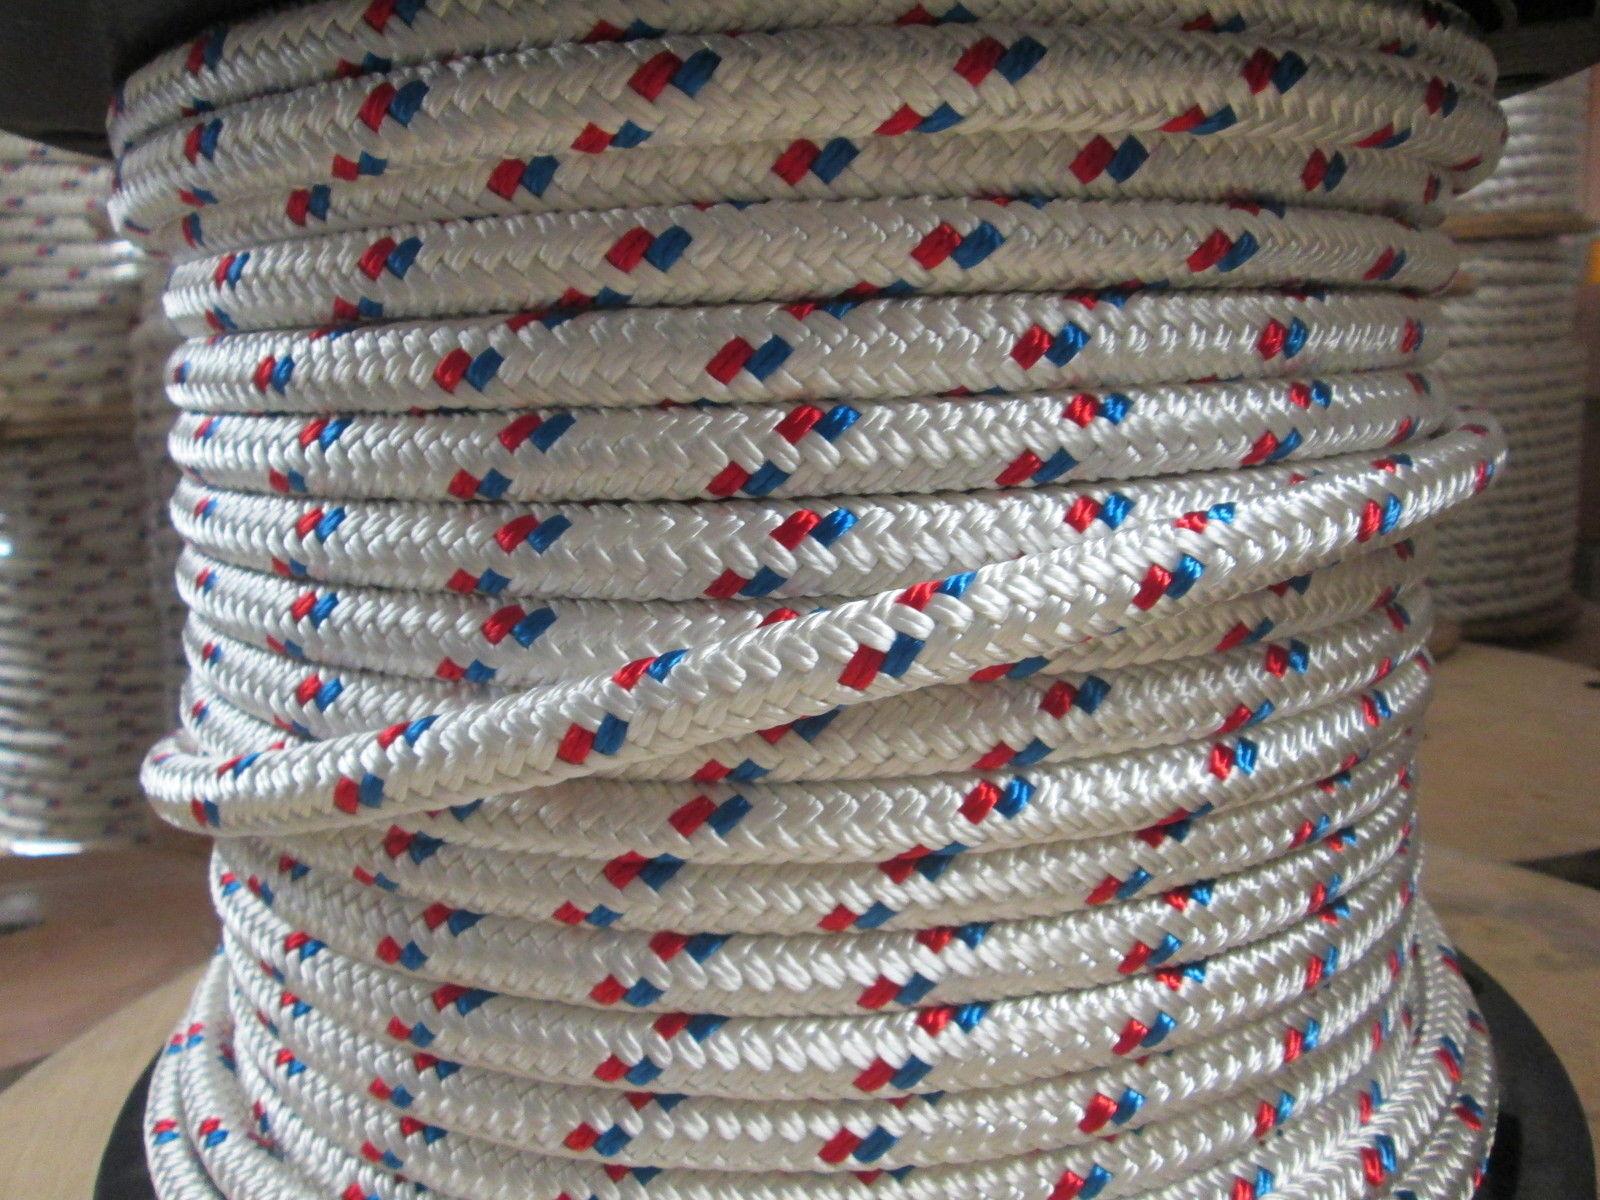 Tree Boss Arborist Rope, MAIN LINE Bull ROPE,10,700 Lb   Rope,9 16  x 300'  USA